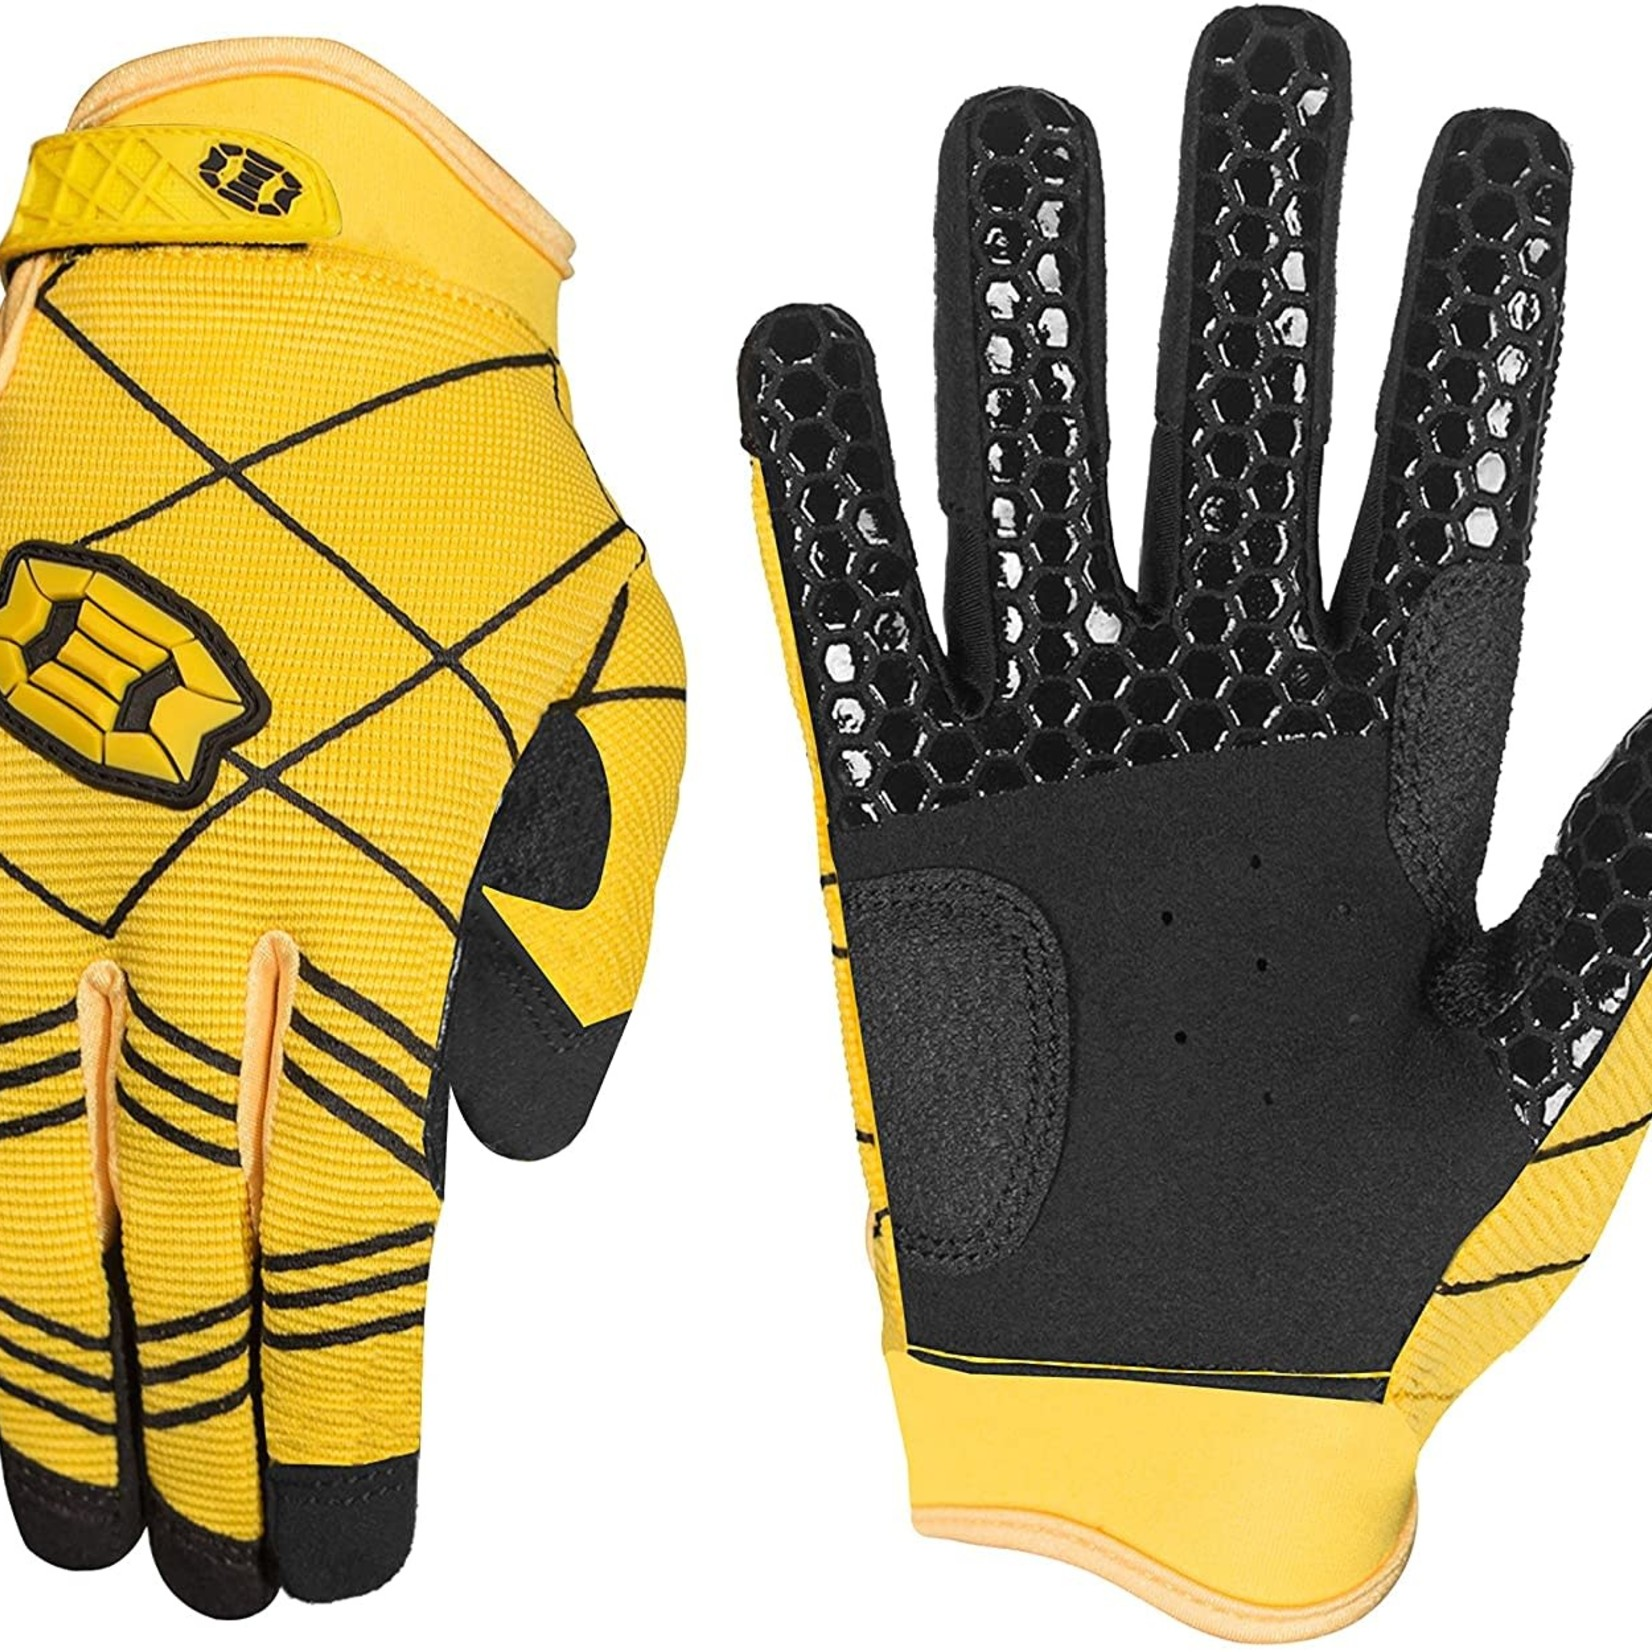 Seibertron B-A-R PRO 2.0 Signature Baseball/Softball Batting Gloves-Adult XL